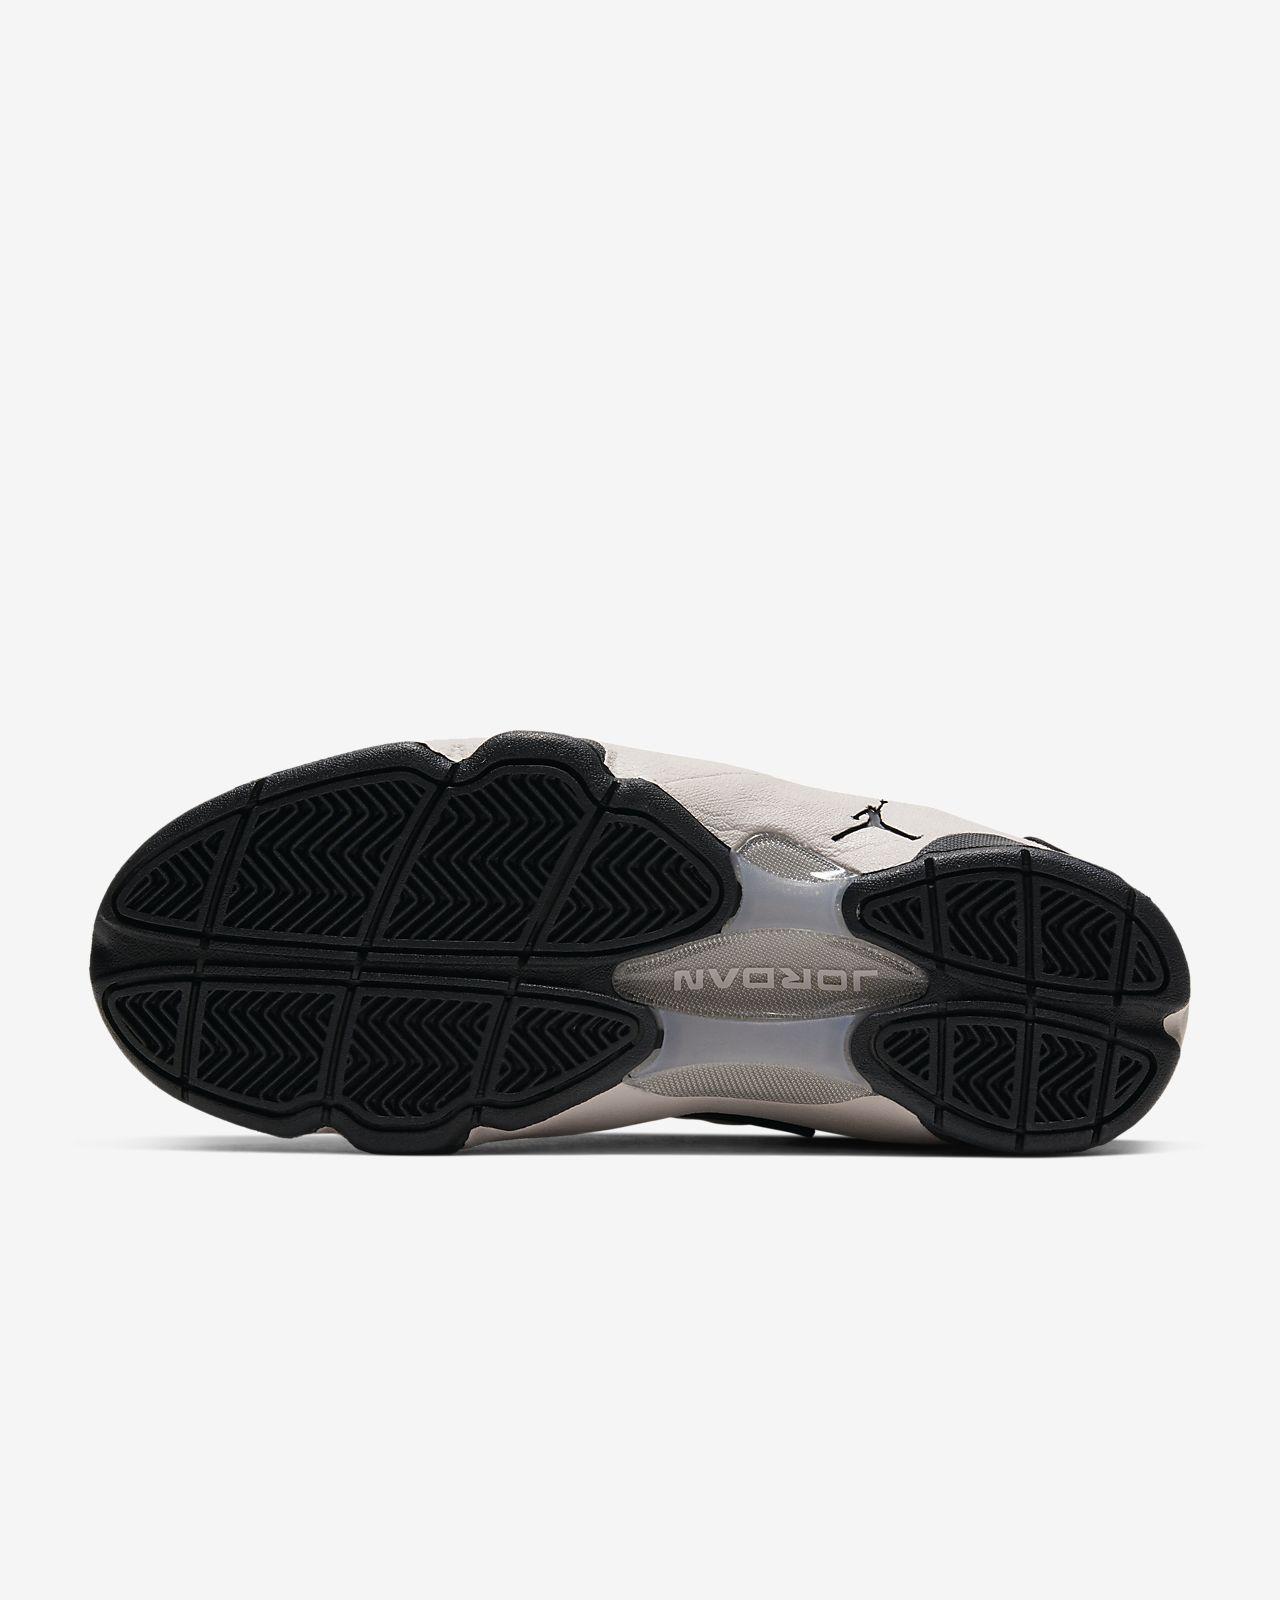 Jordan AIR JORDAN OG - Sneakersy wysokie - barely rose/black